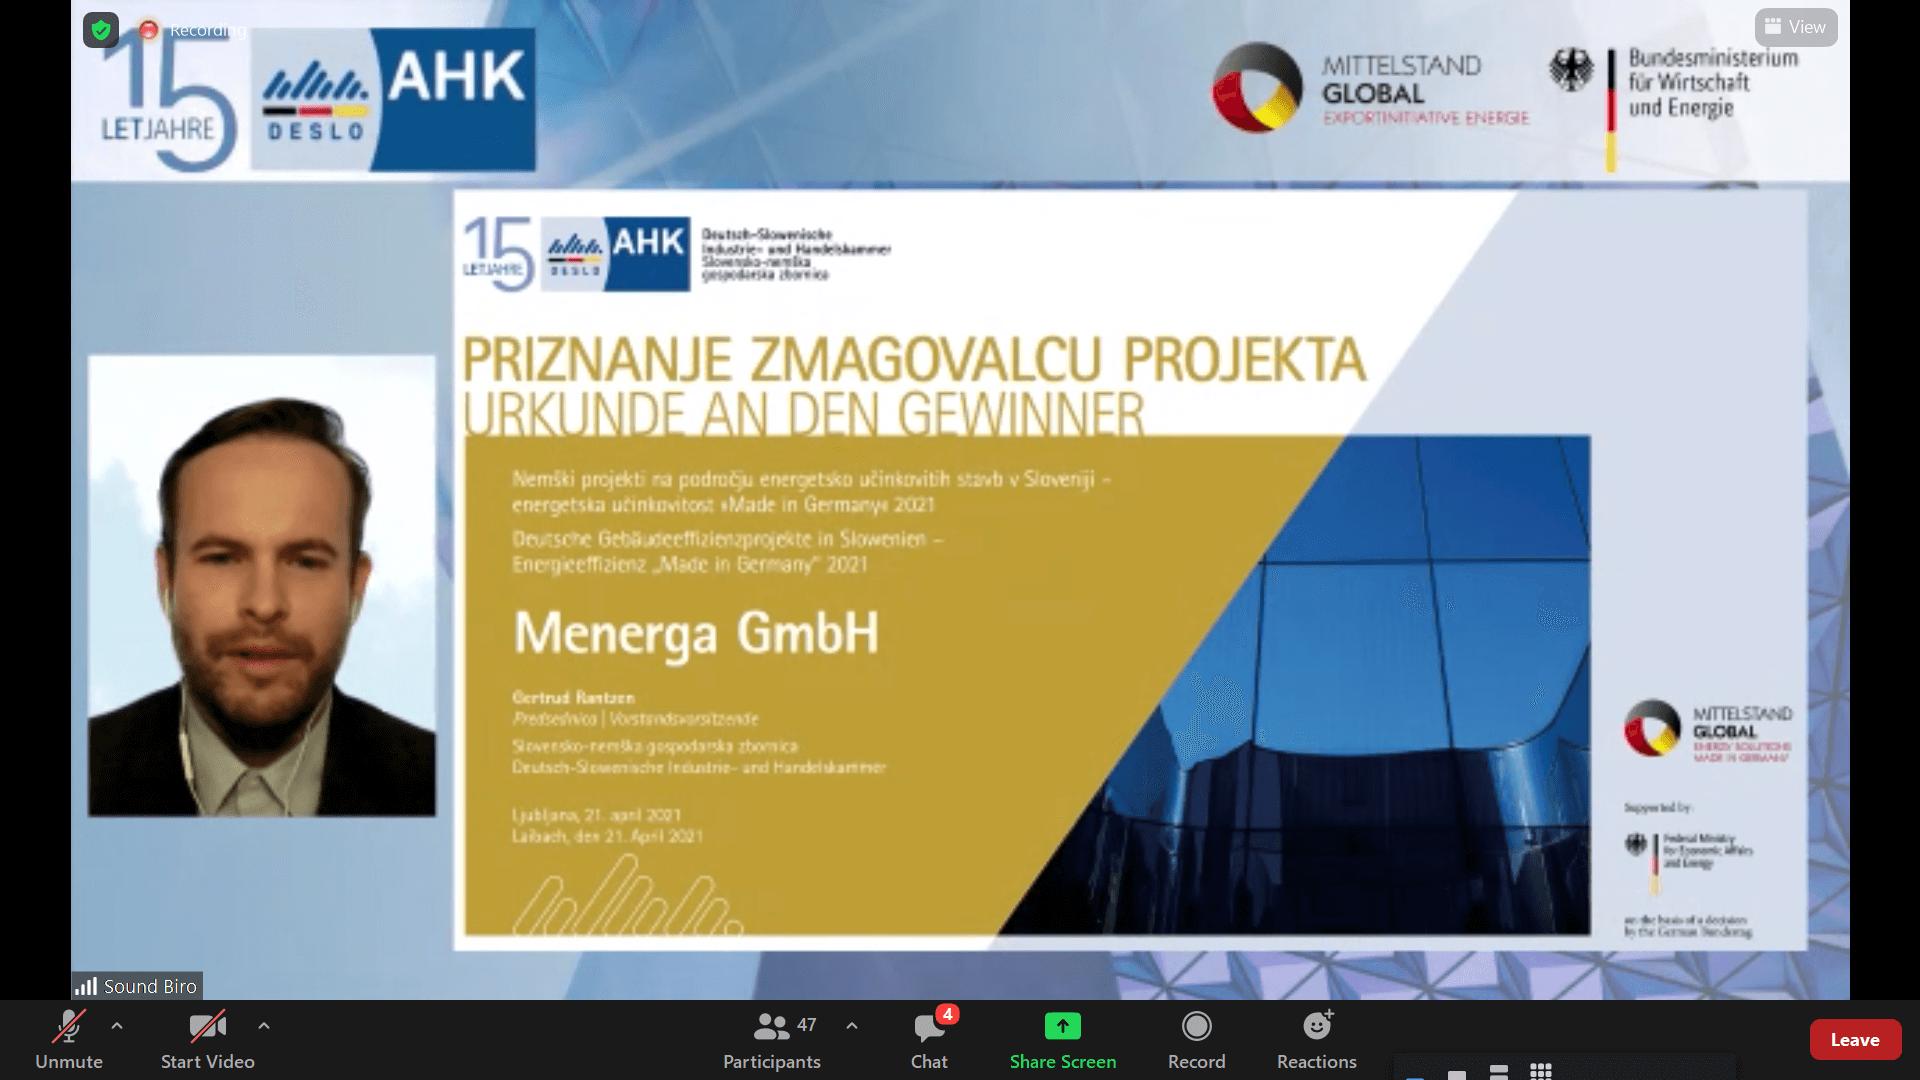 menerga-ahk-nagrada-energetsko-ucinkovit-projekt